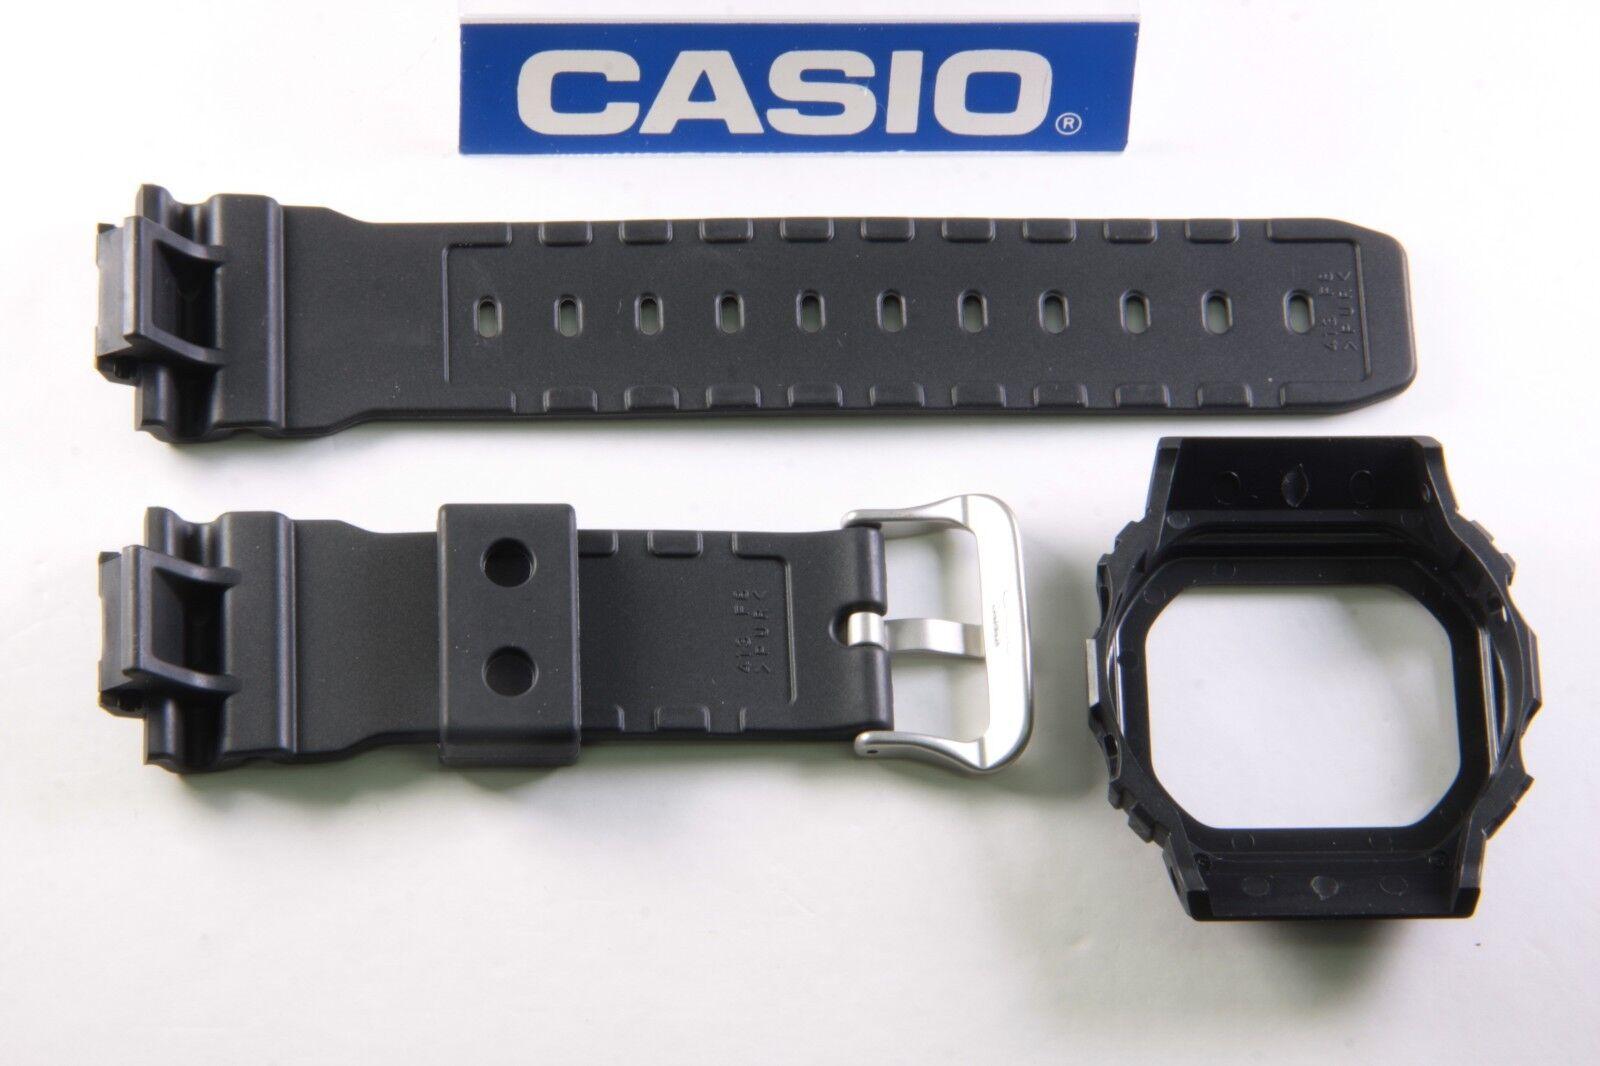 5def0f46a1416 Casio G-Shock DW-5600SL-1 New Band Bezel Combo Black Slash Pattern ...